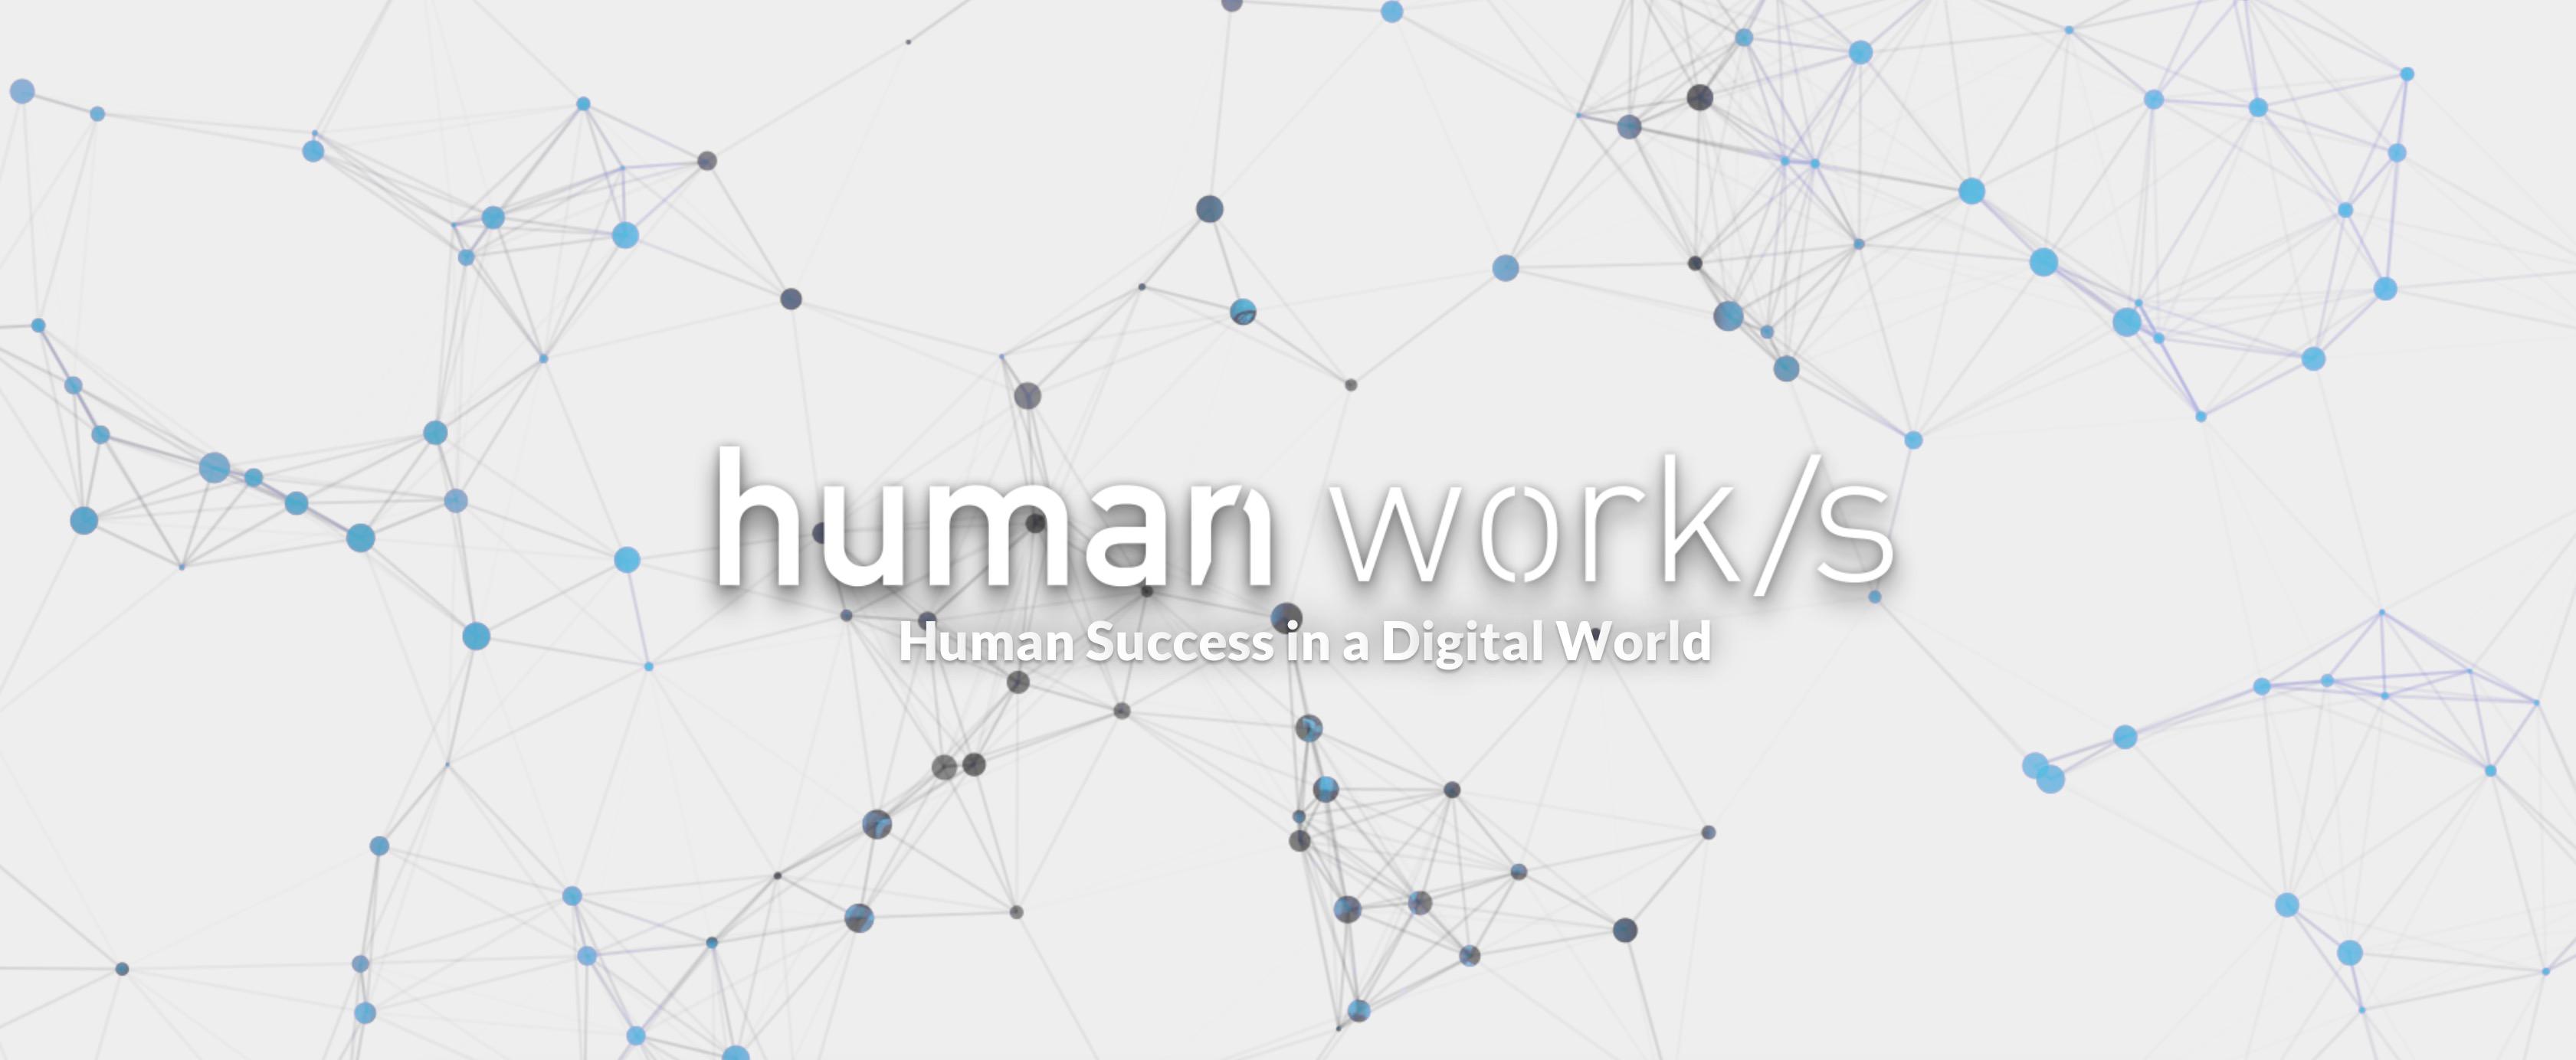 Thumbnail of https://www.reif.org/blog/aus-promerit-neujahrsempfang-wird-human-works/